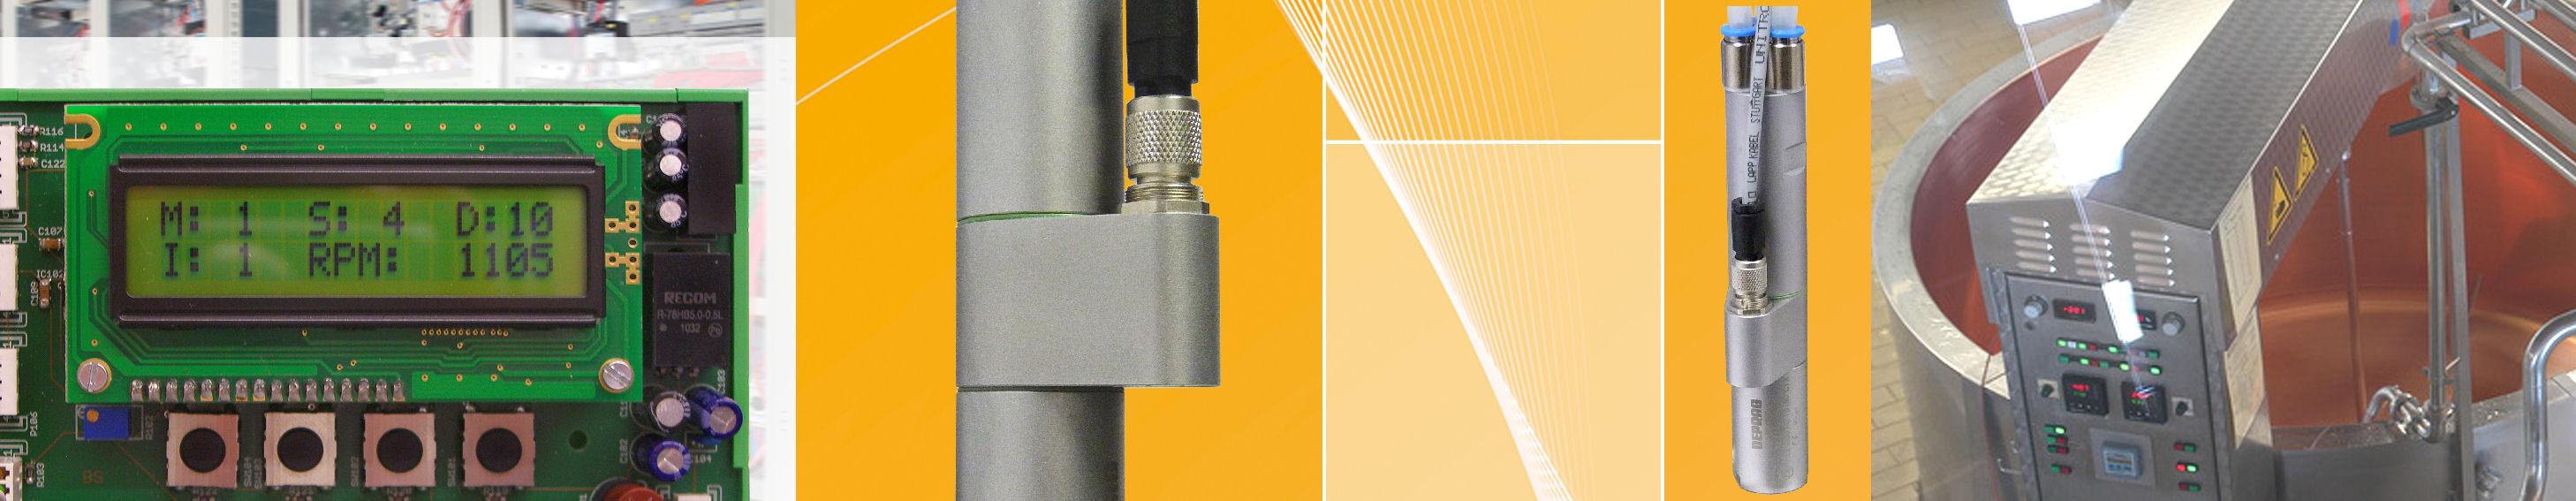 Speed regulator   airmotor   control speed of airmotors